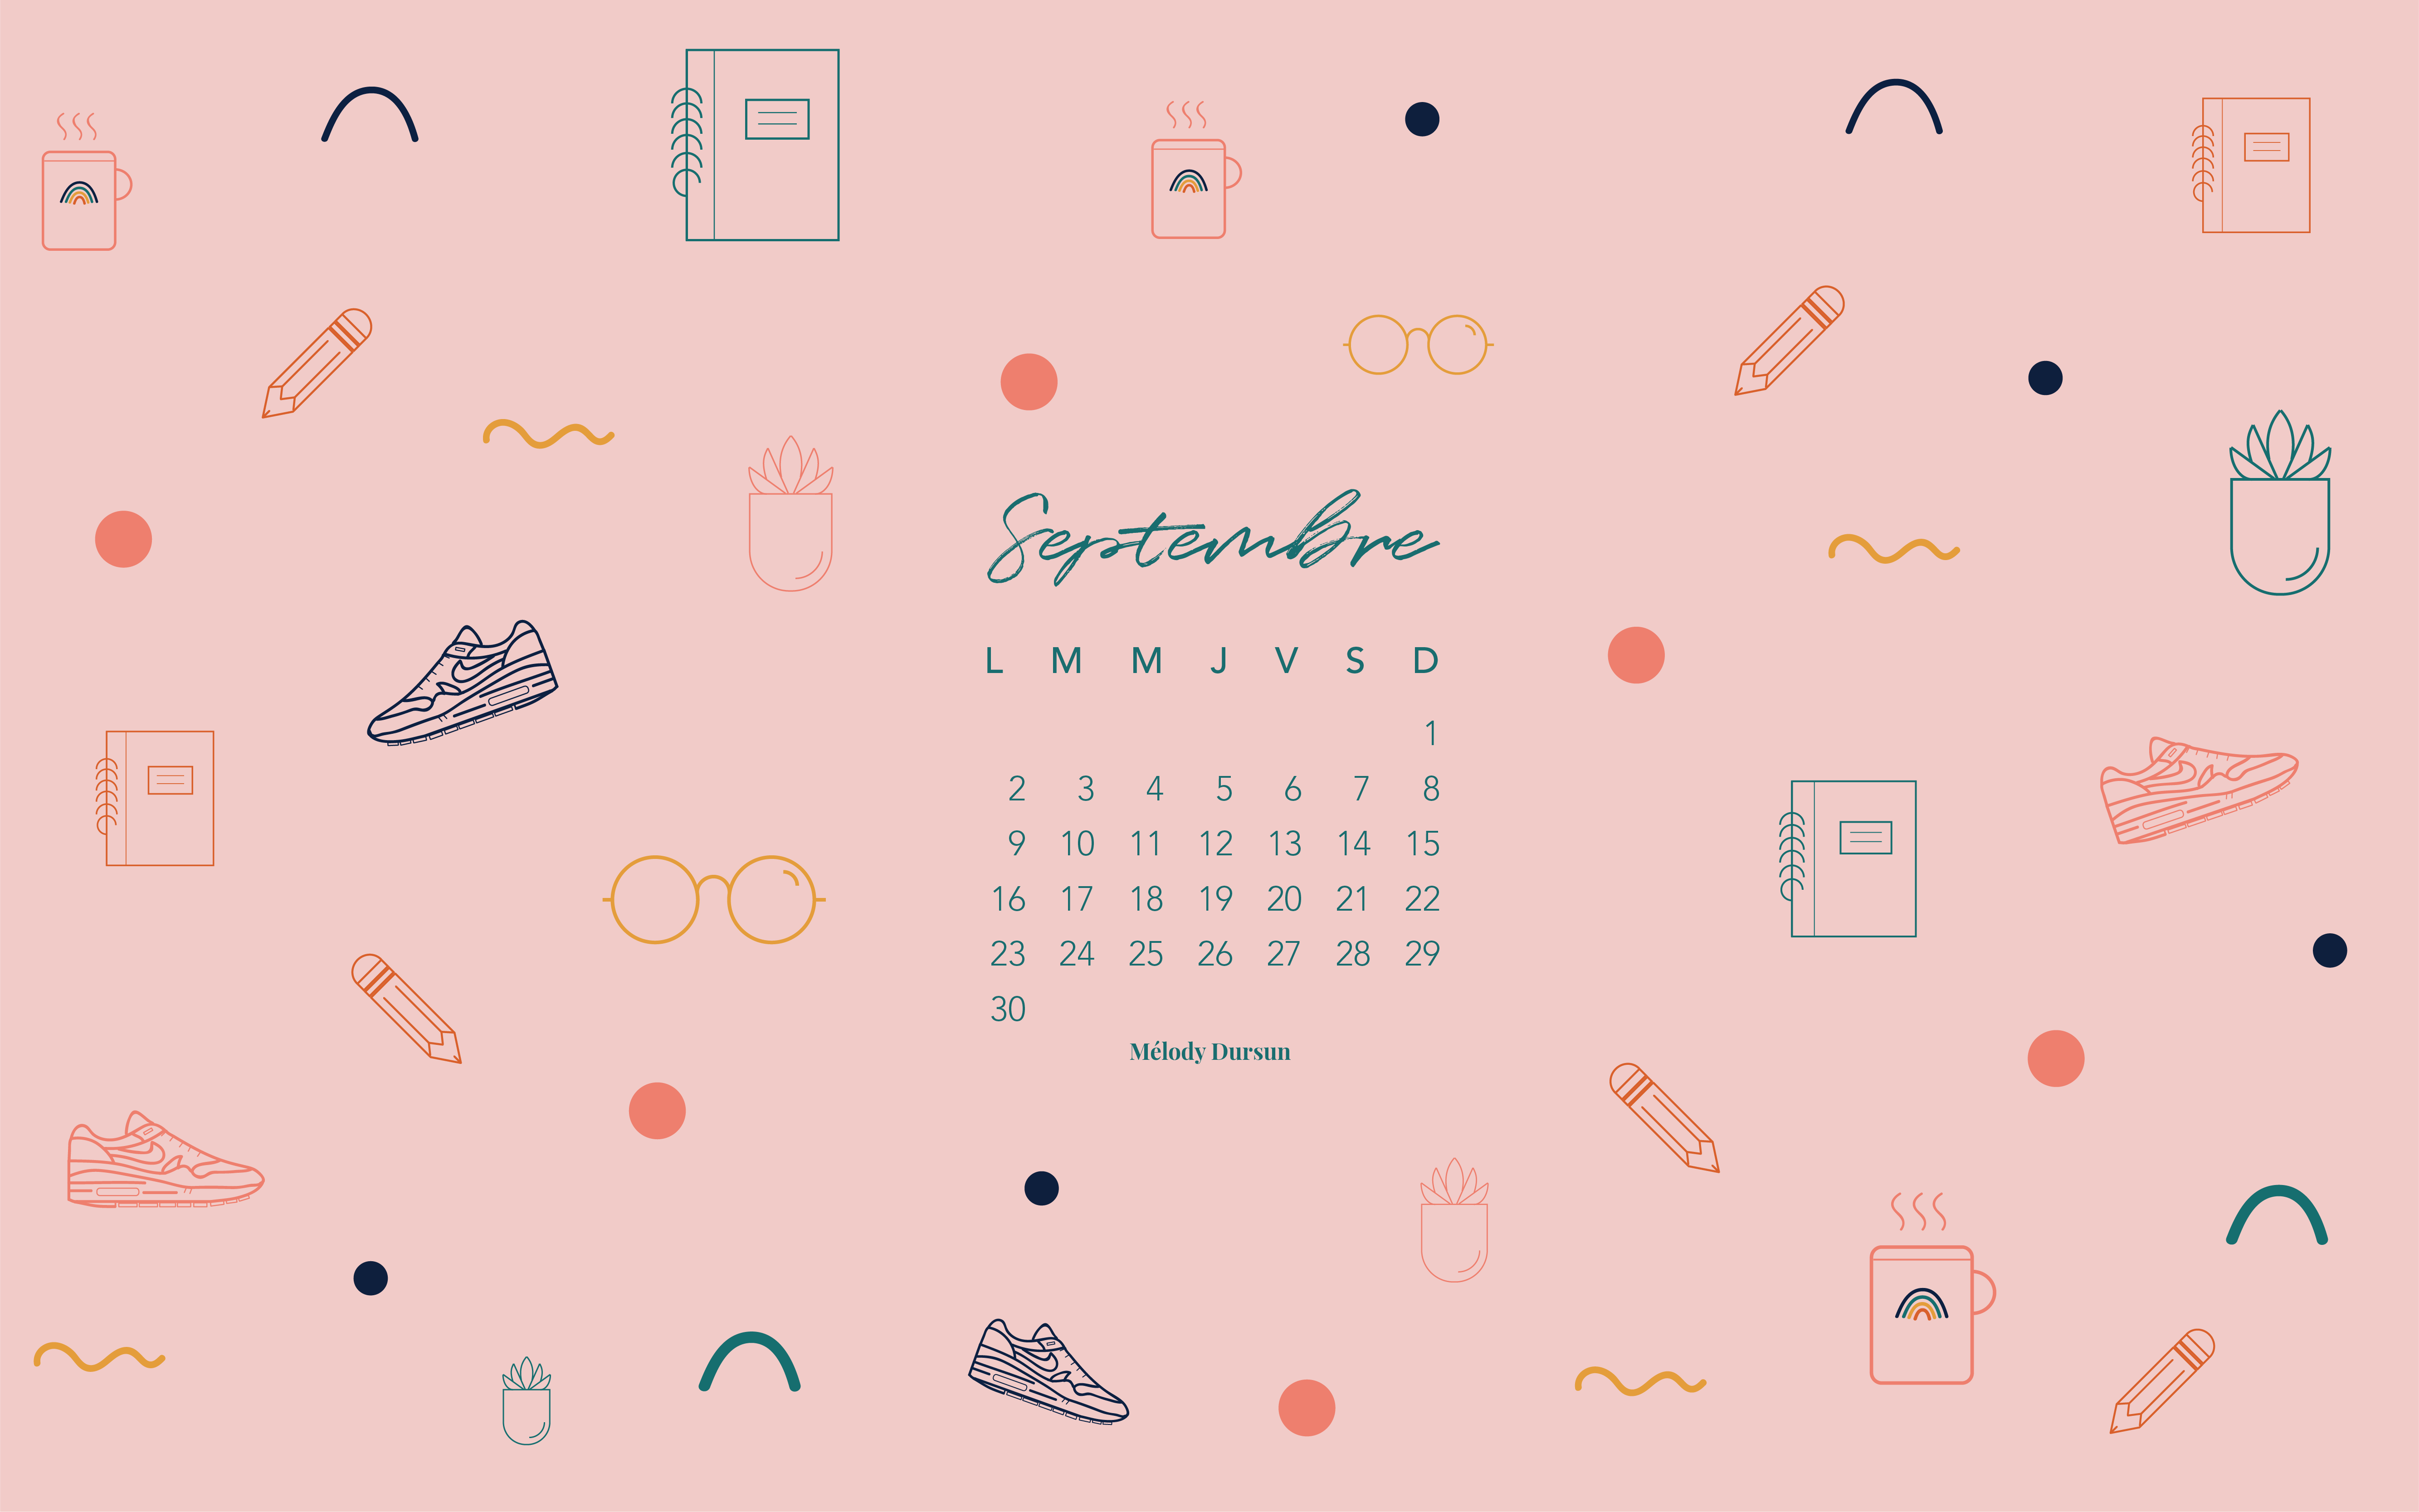 Calendrier & fonds d'écran – Septembre 2019